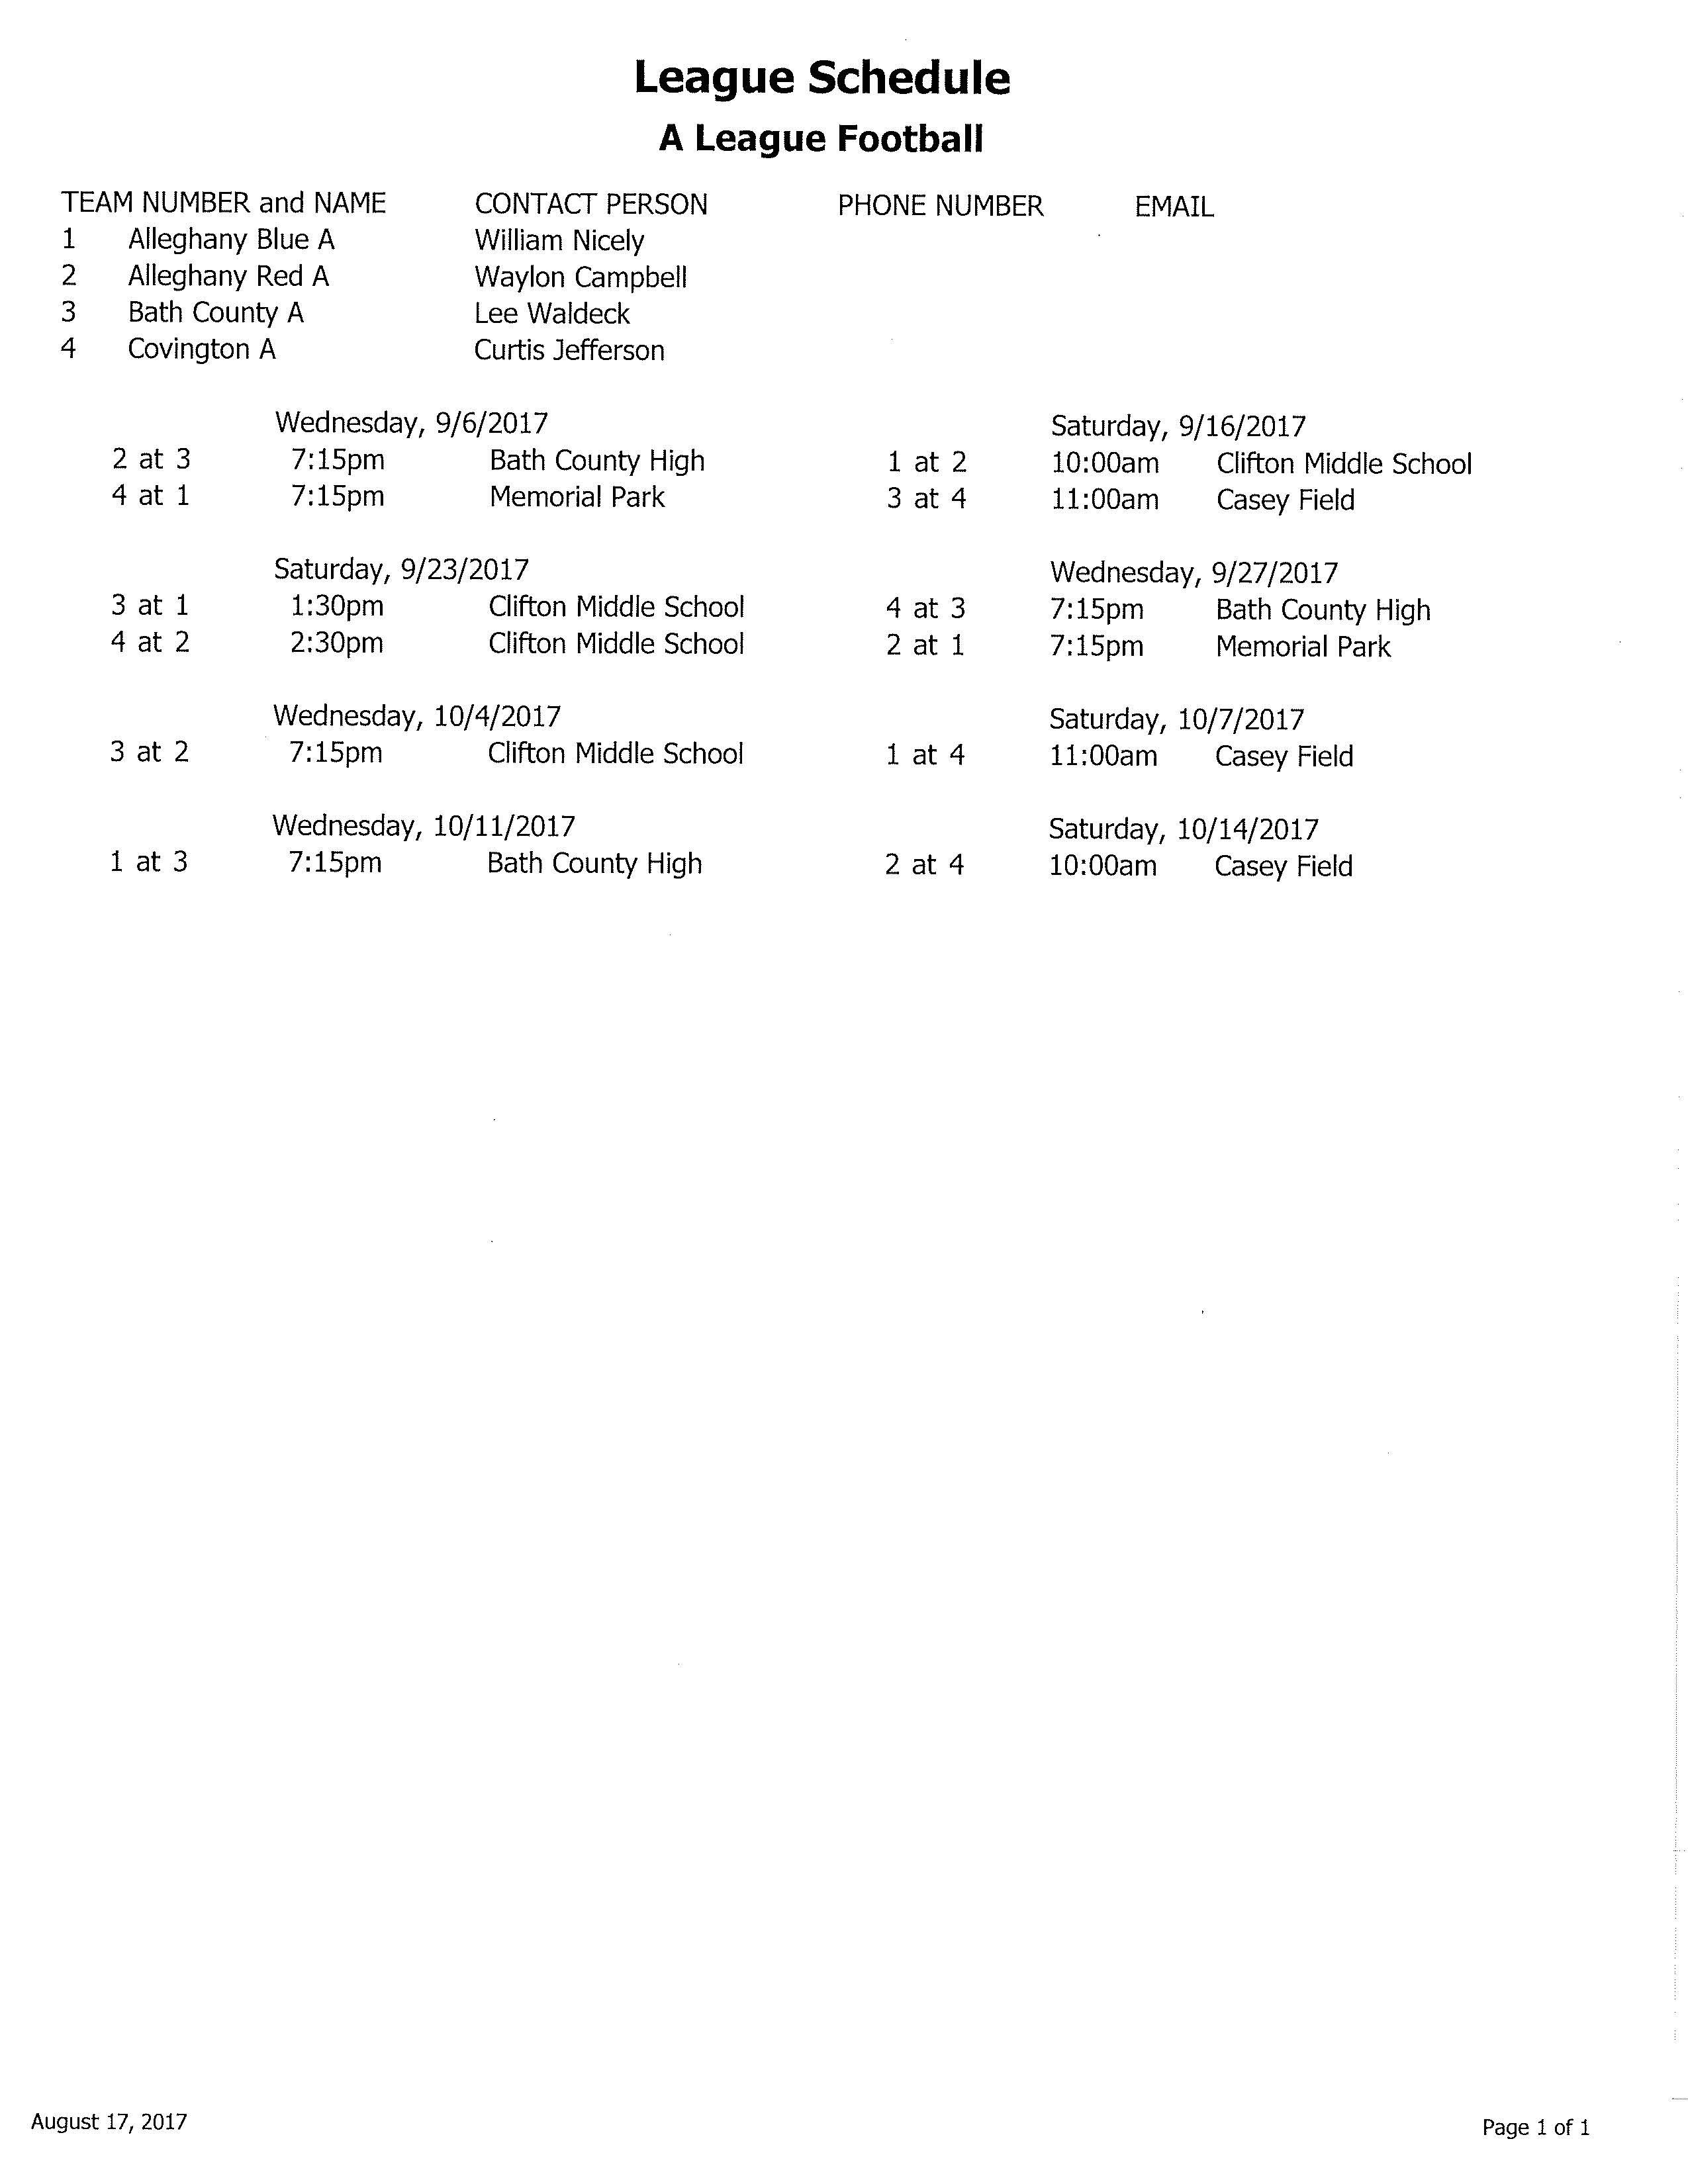 2017 A League Football Schedule